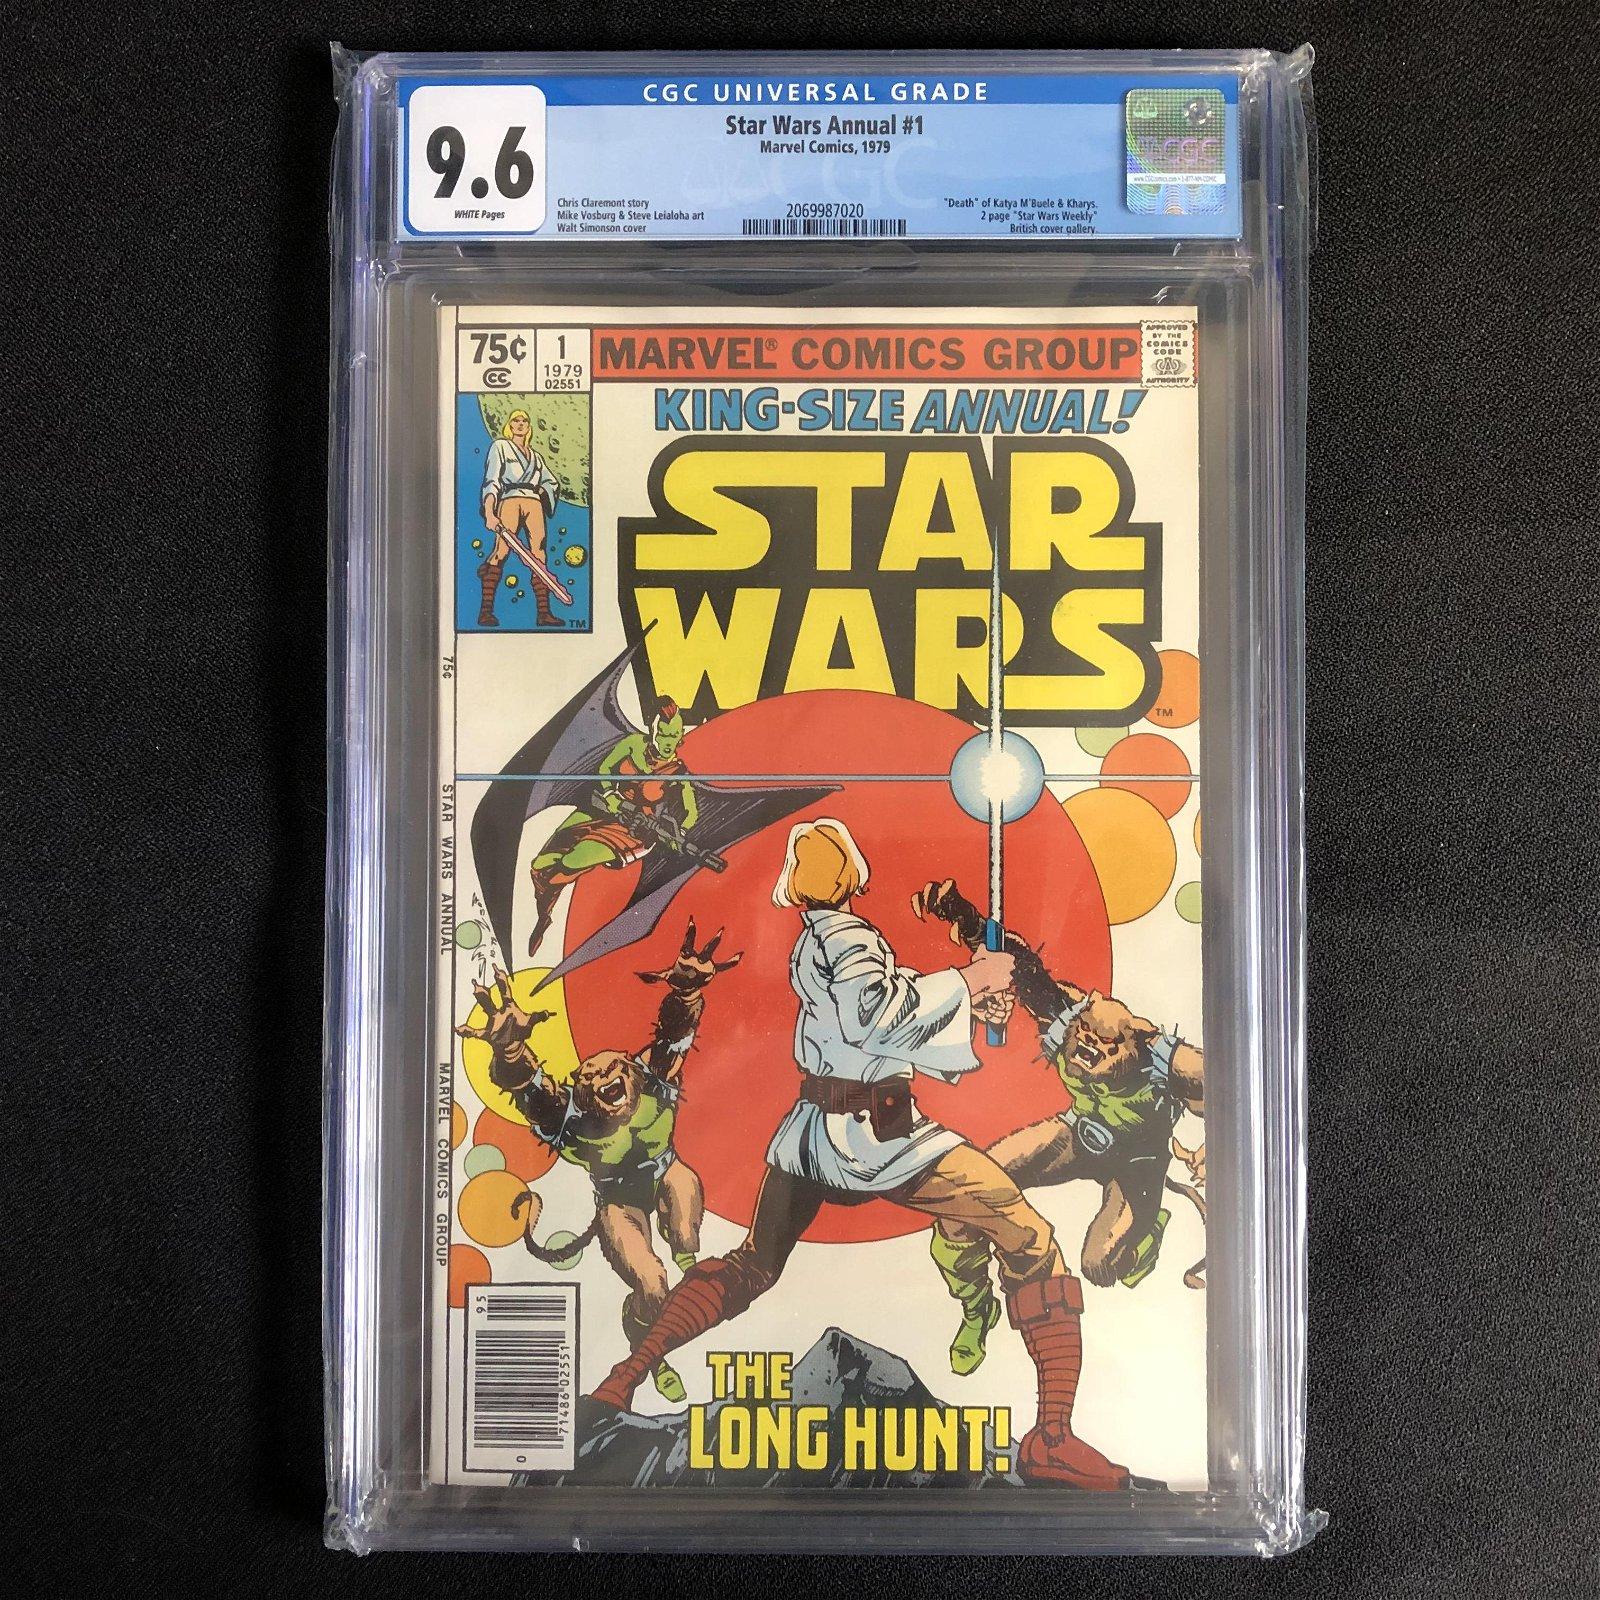 STAR WARS ANNUAL #1 (MARVEL COMICS) 1979 -9.6 GRADE-